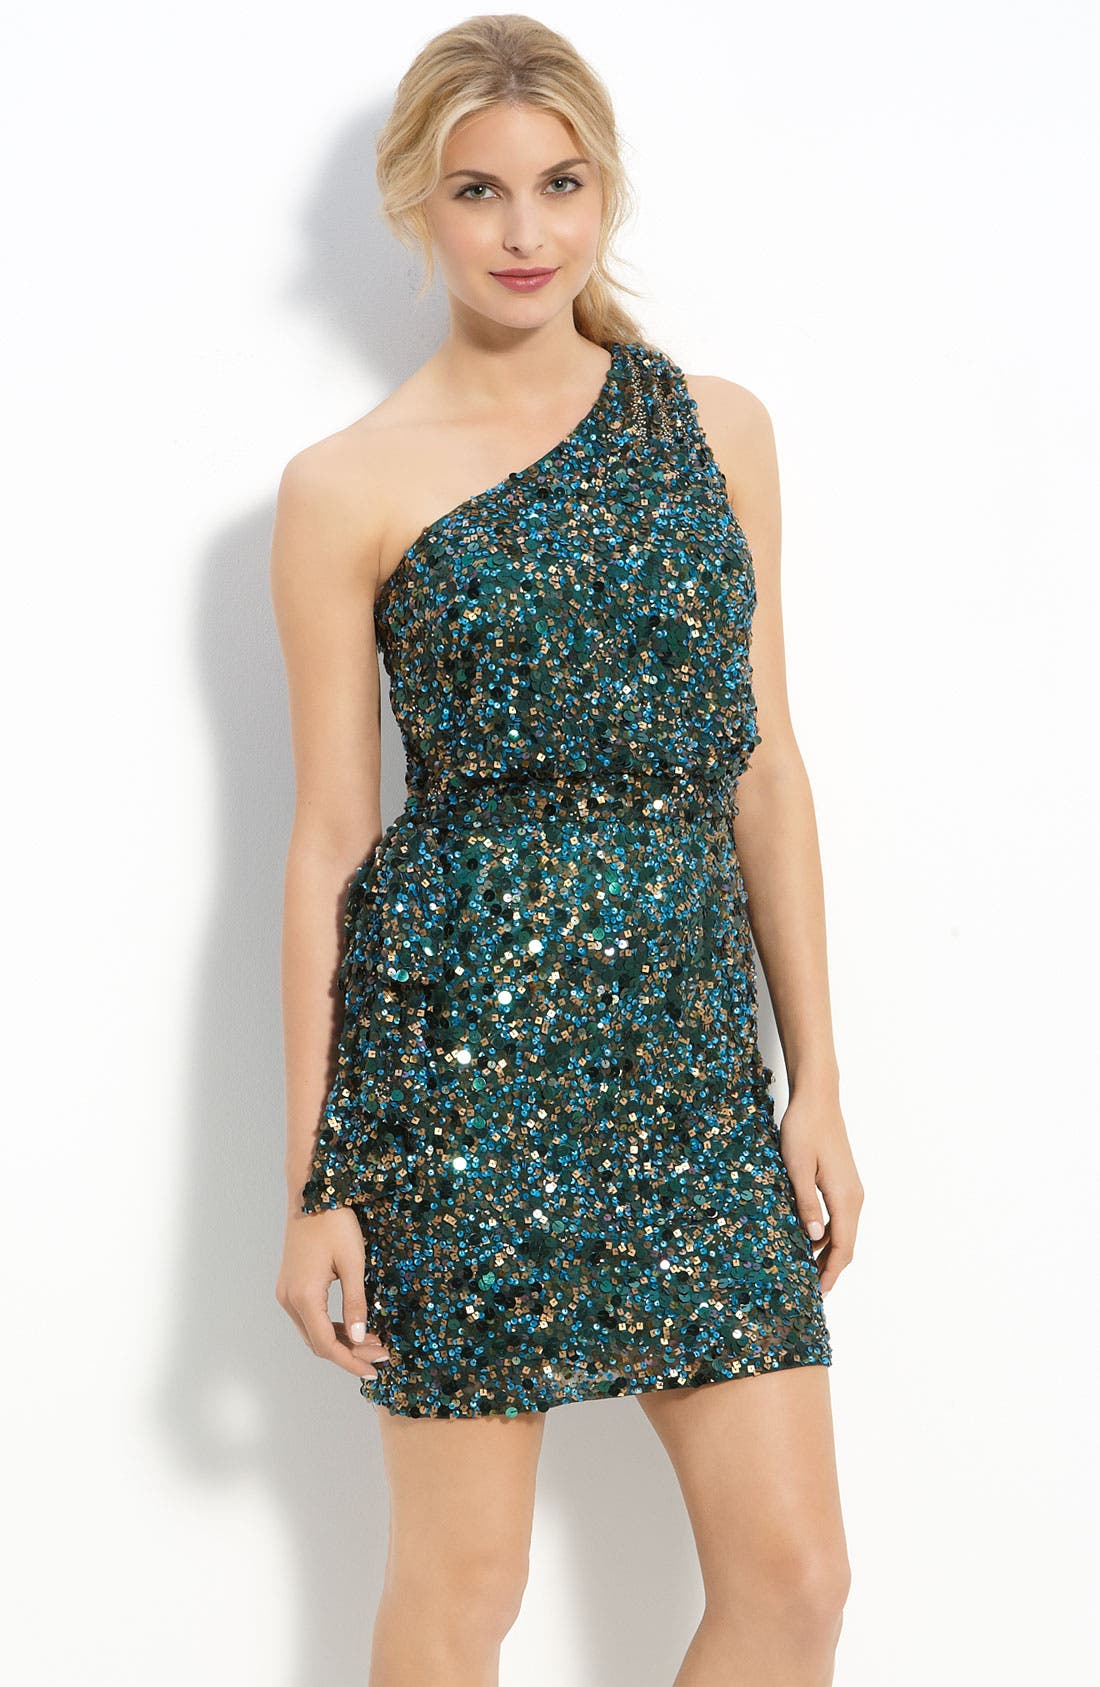 Alternate Image 1 Selected - Aidan Mattox Sequin One Shoulder Dress